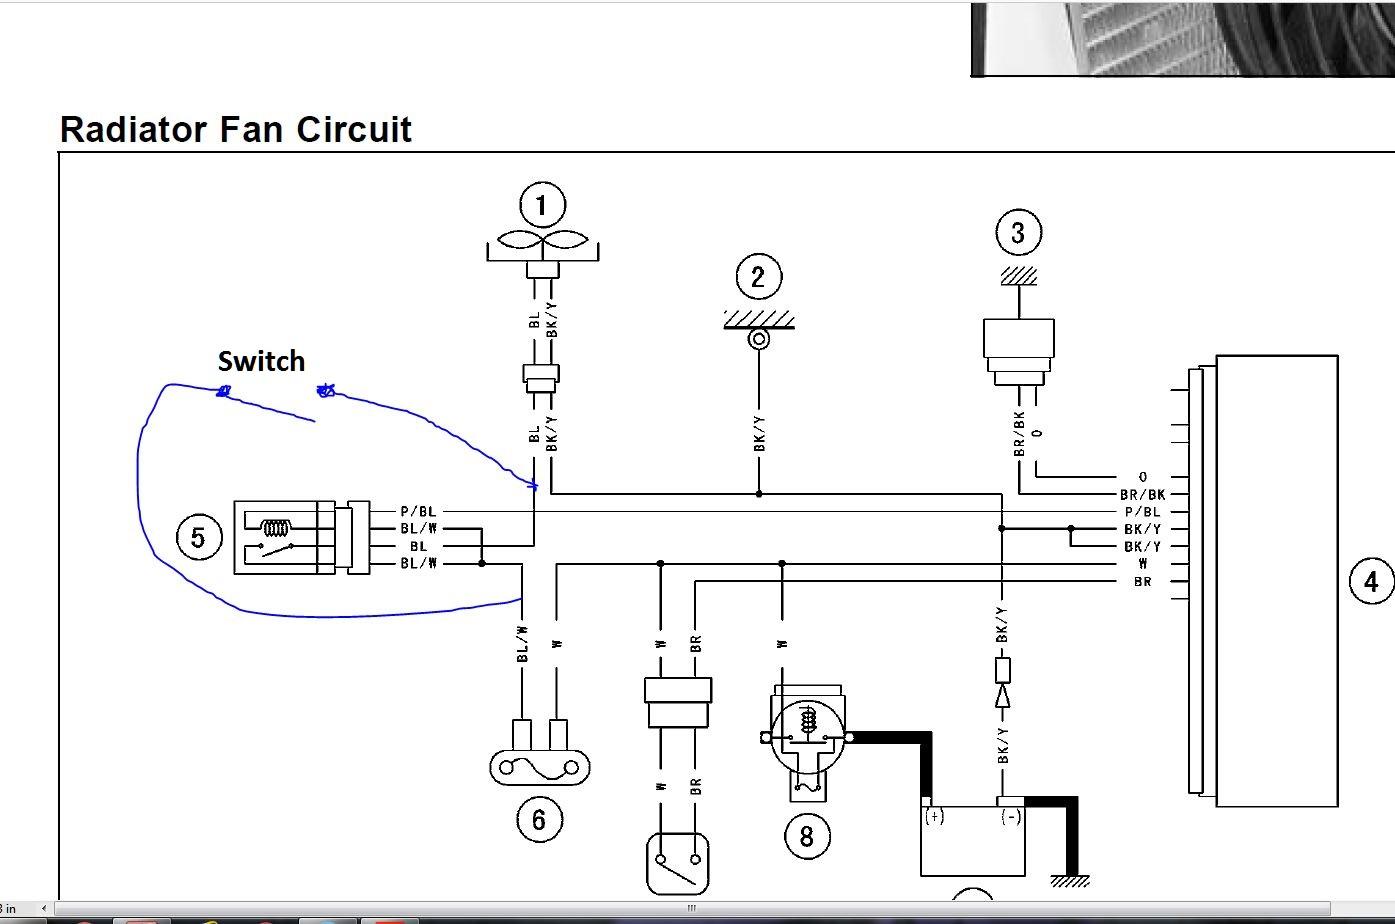 Kfx 450 Wiring Diagram Explained Diagrams Crf Schematics Kawasaki Kfx450r Residential Electrical Symbols U2022 50